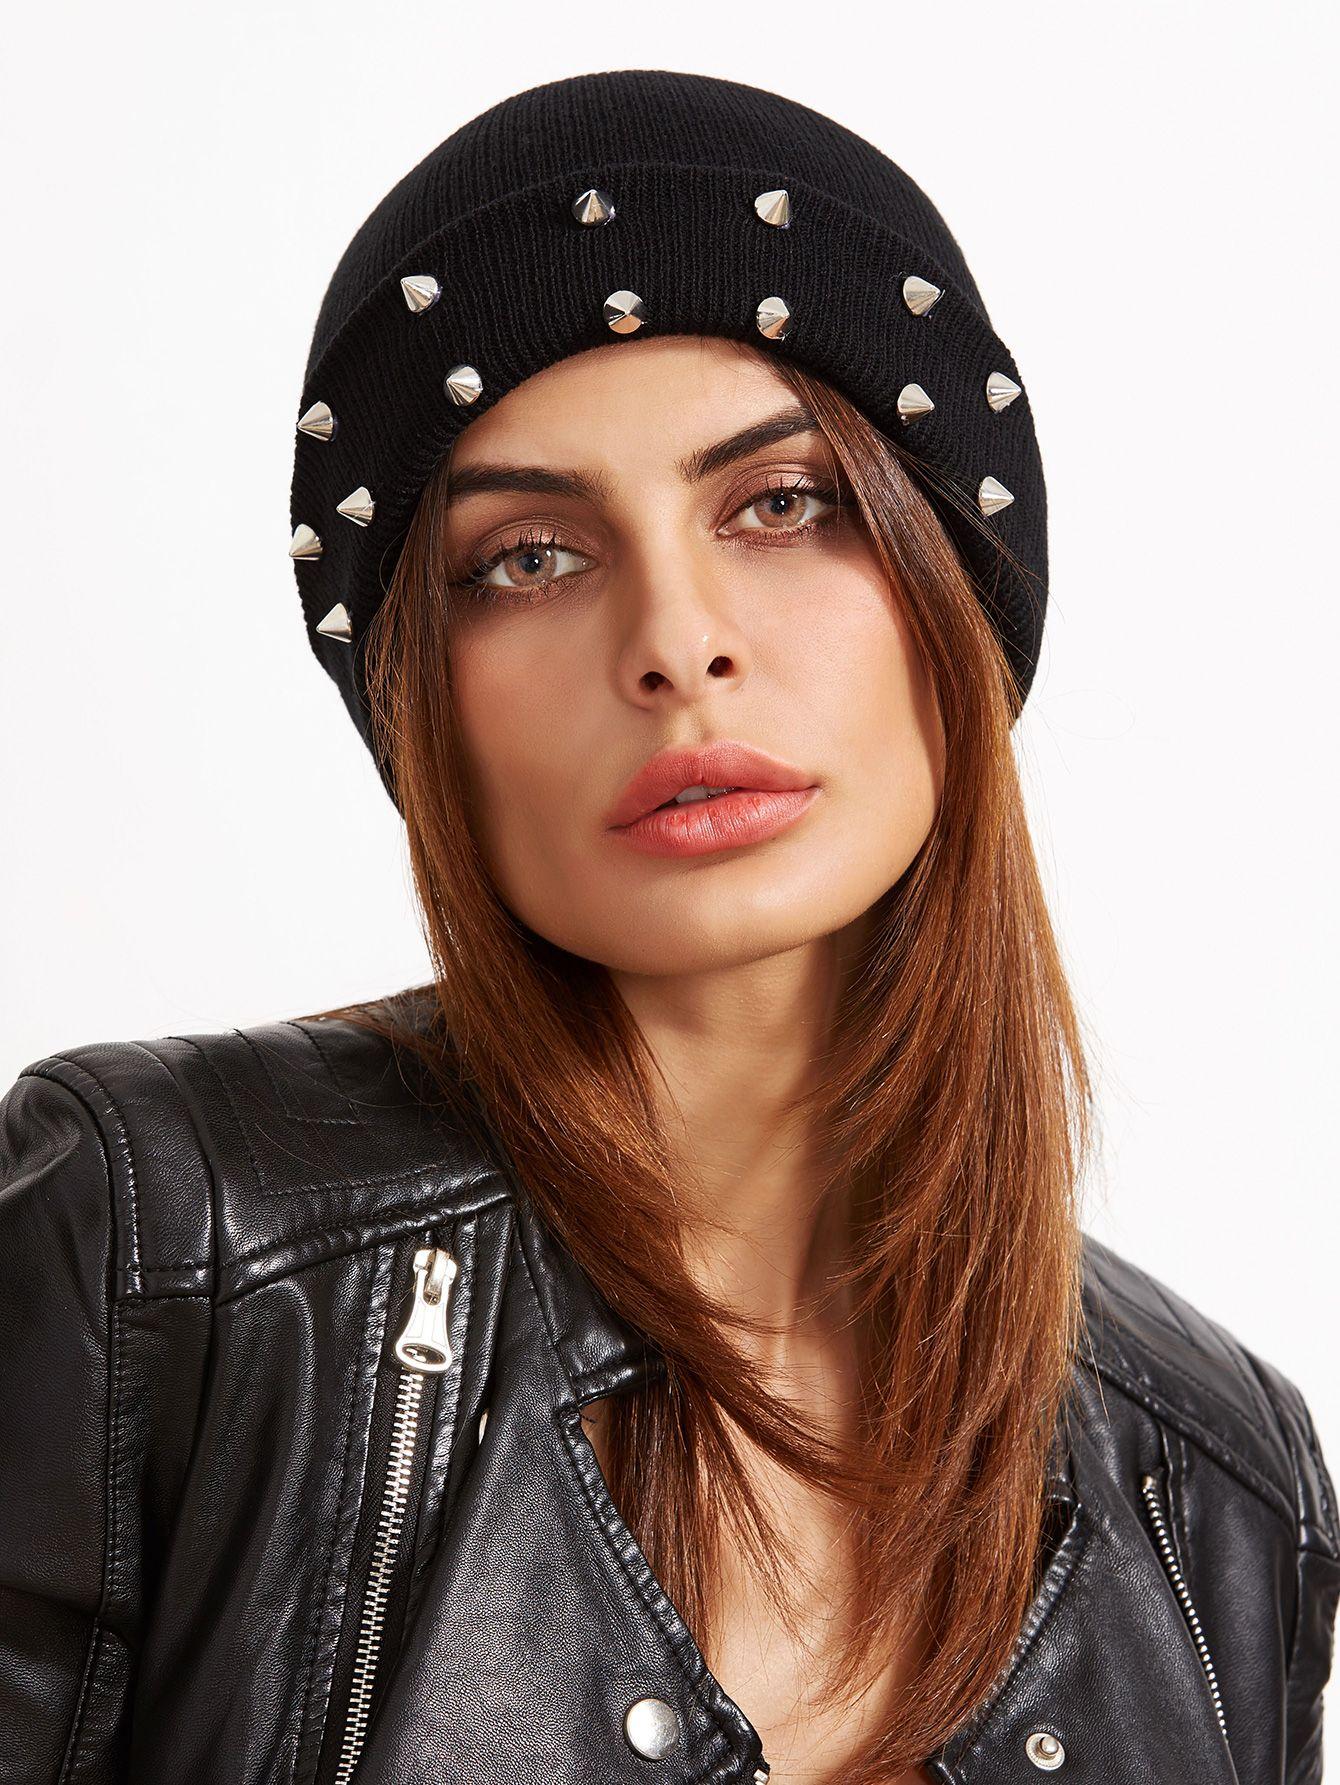 6a193bb5c9 Shop Black Spike Studded Knit Beanie Hat For Women online. SheIn offers  Black Spike Studded Knit Beanie Hat For Women & more to fit your  fashionable needs.